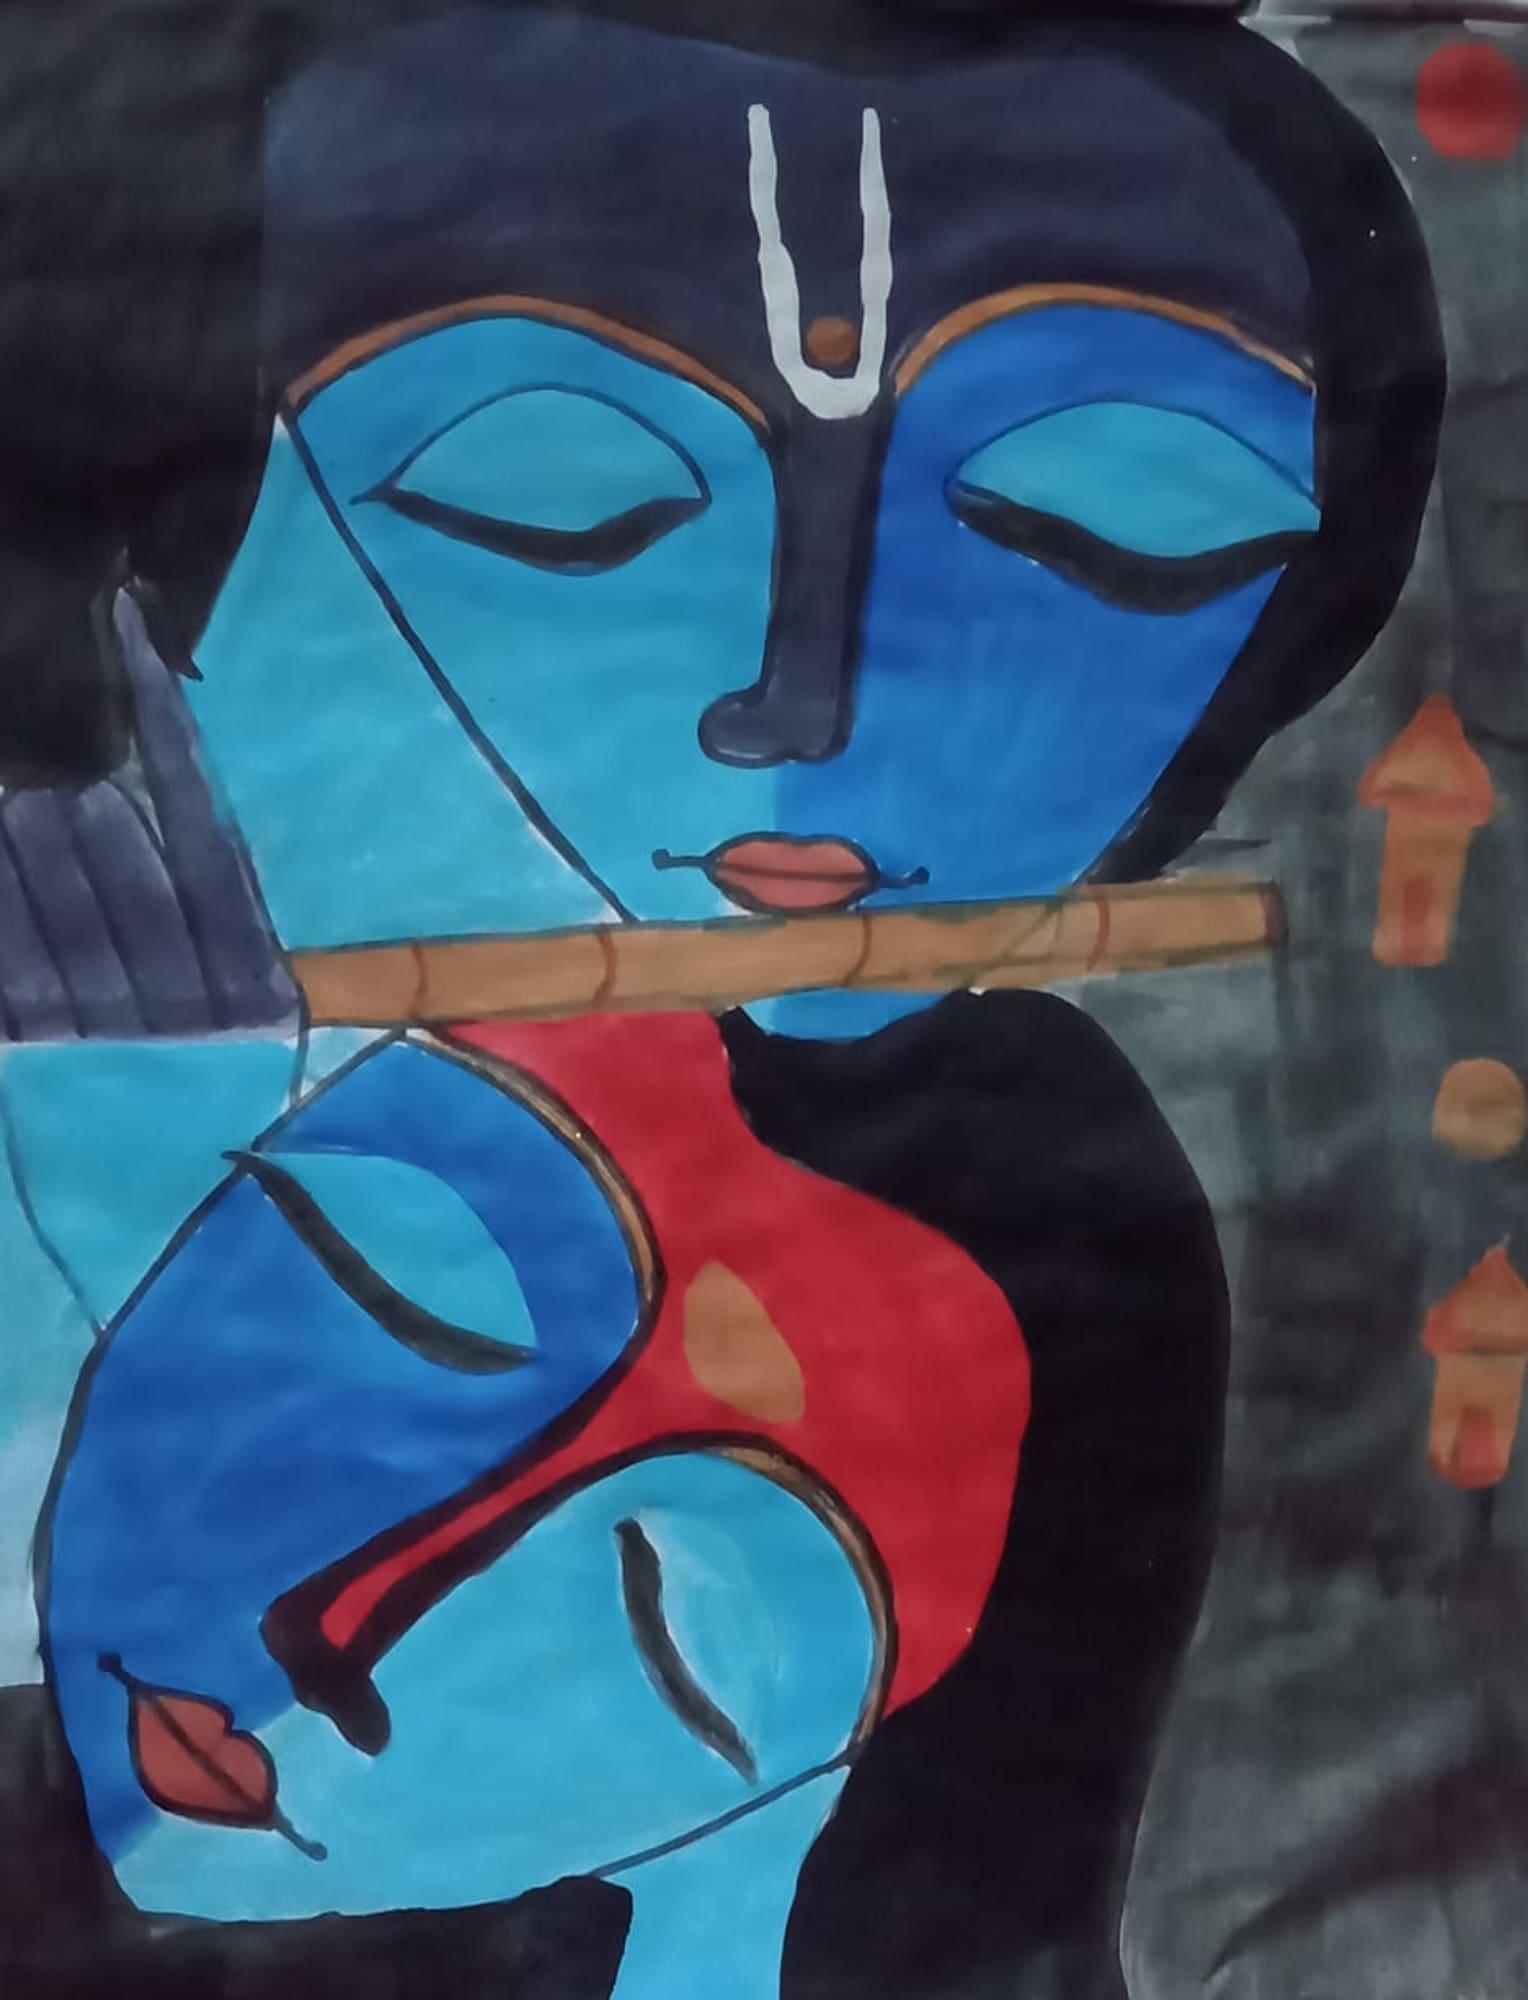 Painting of faces by Nisha Kumari